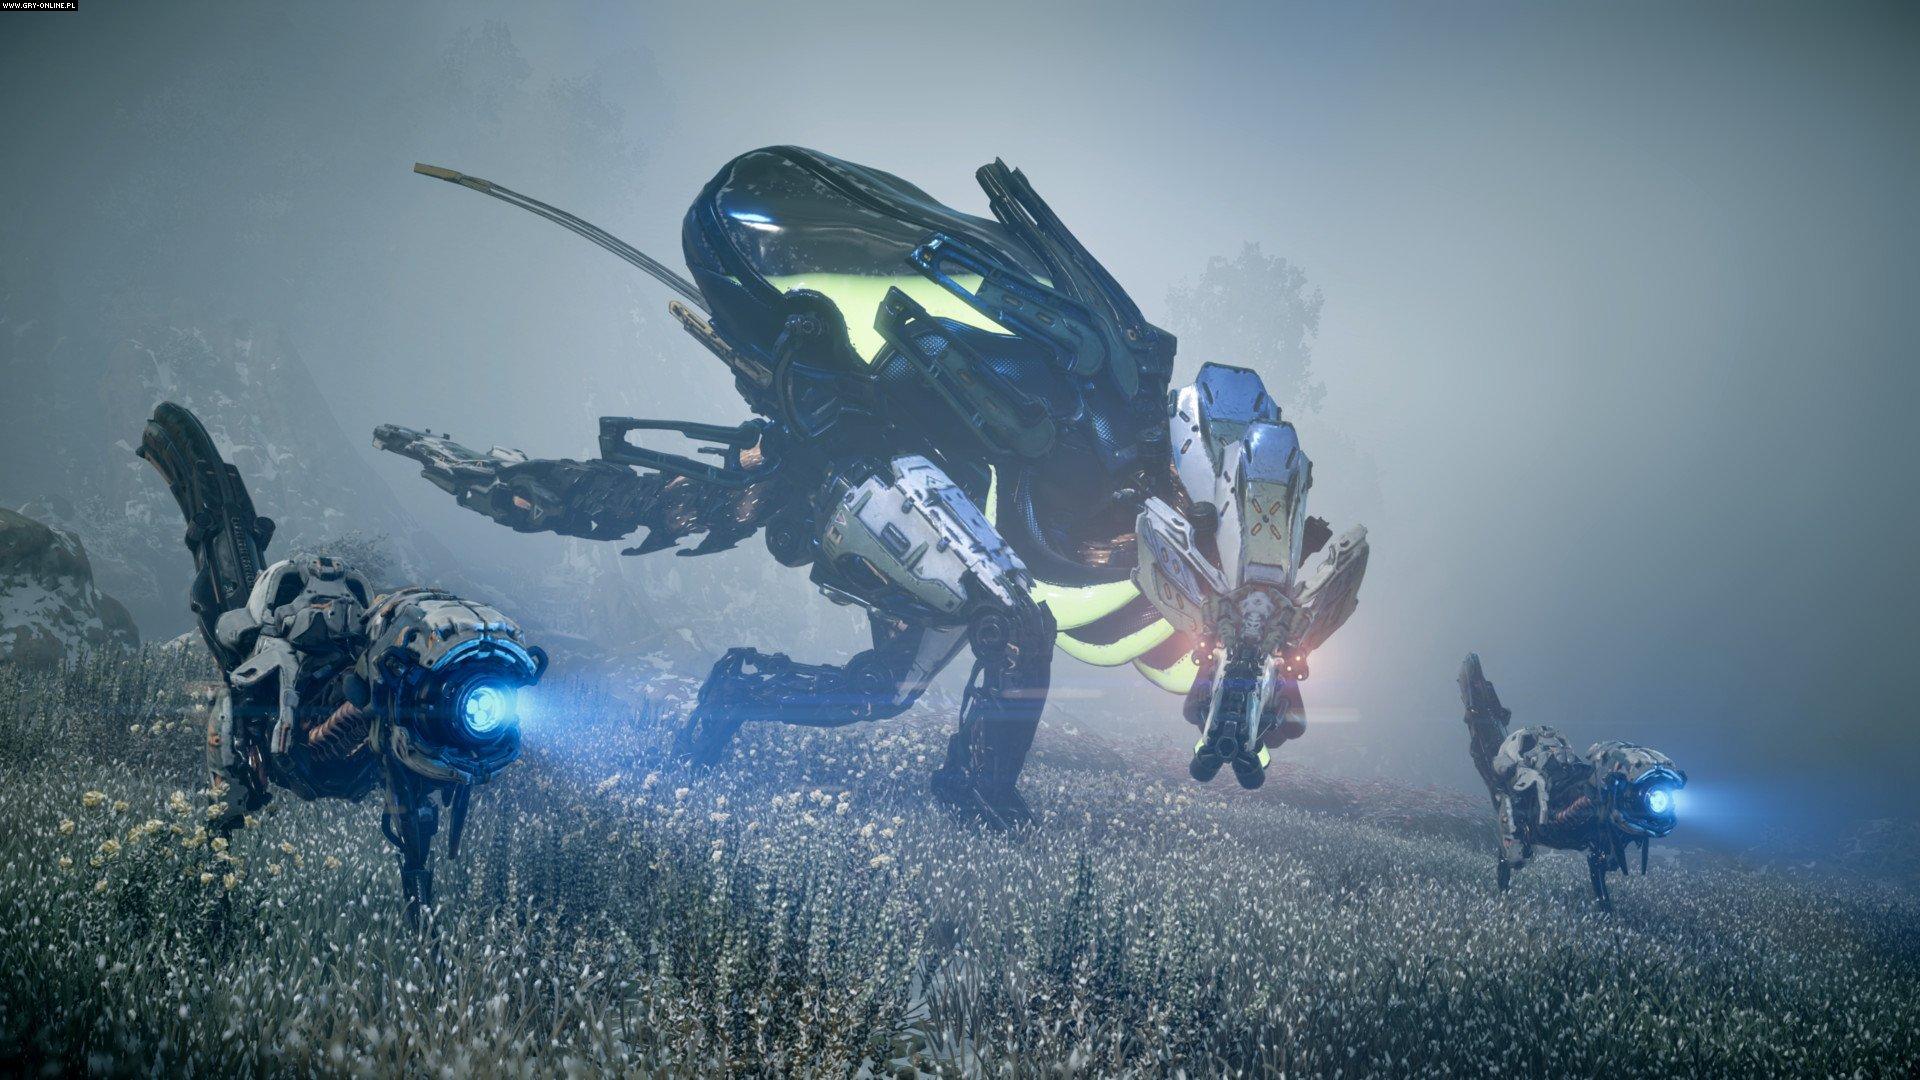 Horizon Zero Dawn PS4 Games Image 5/54, Guerrilla Games, Sony Interactive Entertainment